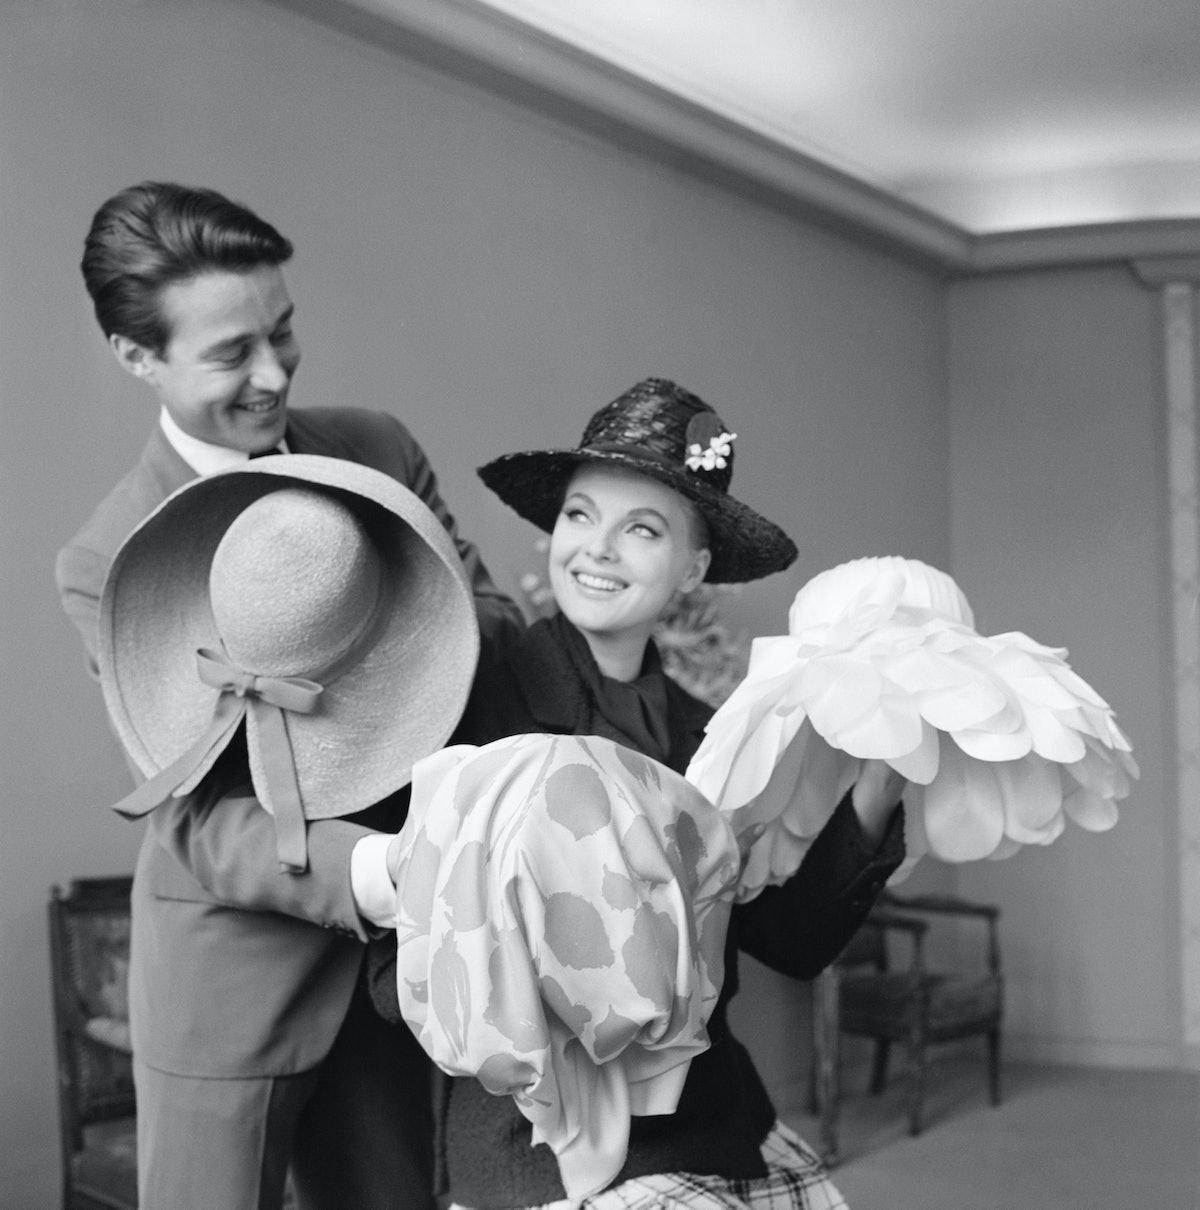 Fashion designer Halston and Italian film star Virna Lisi look at various hats.